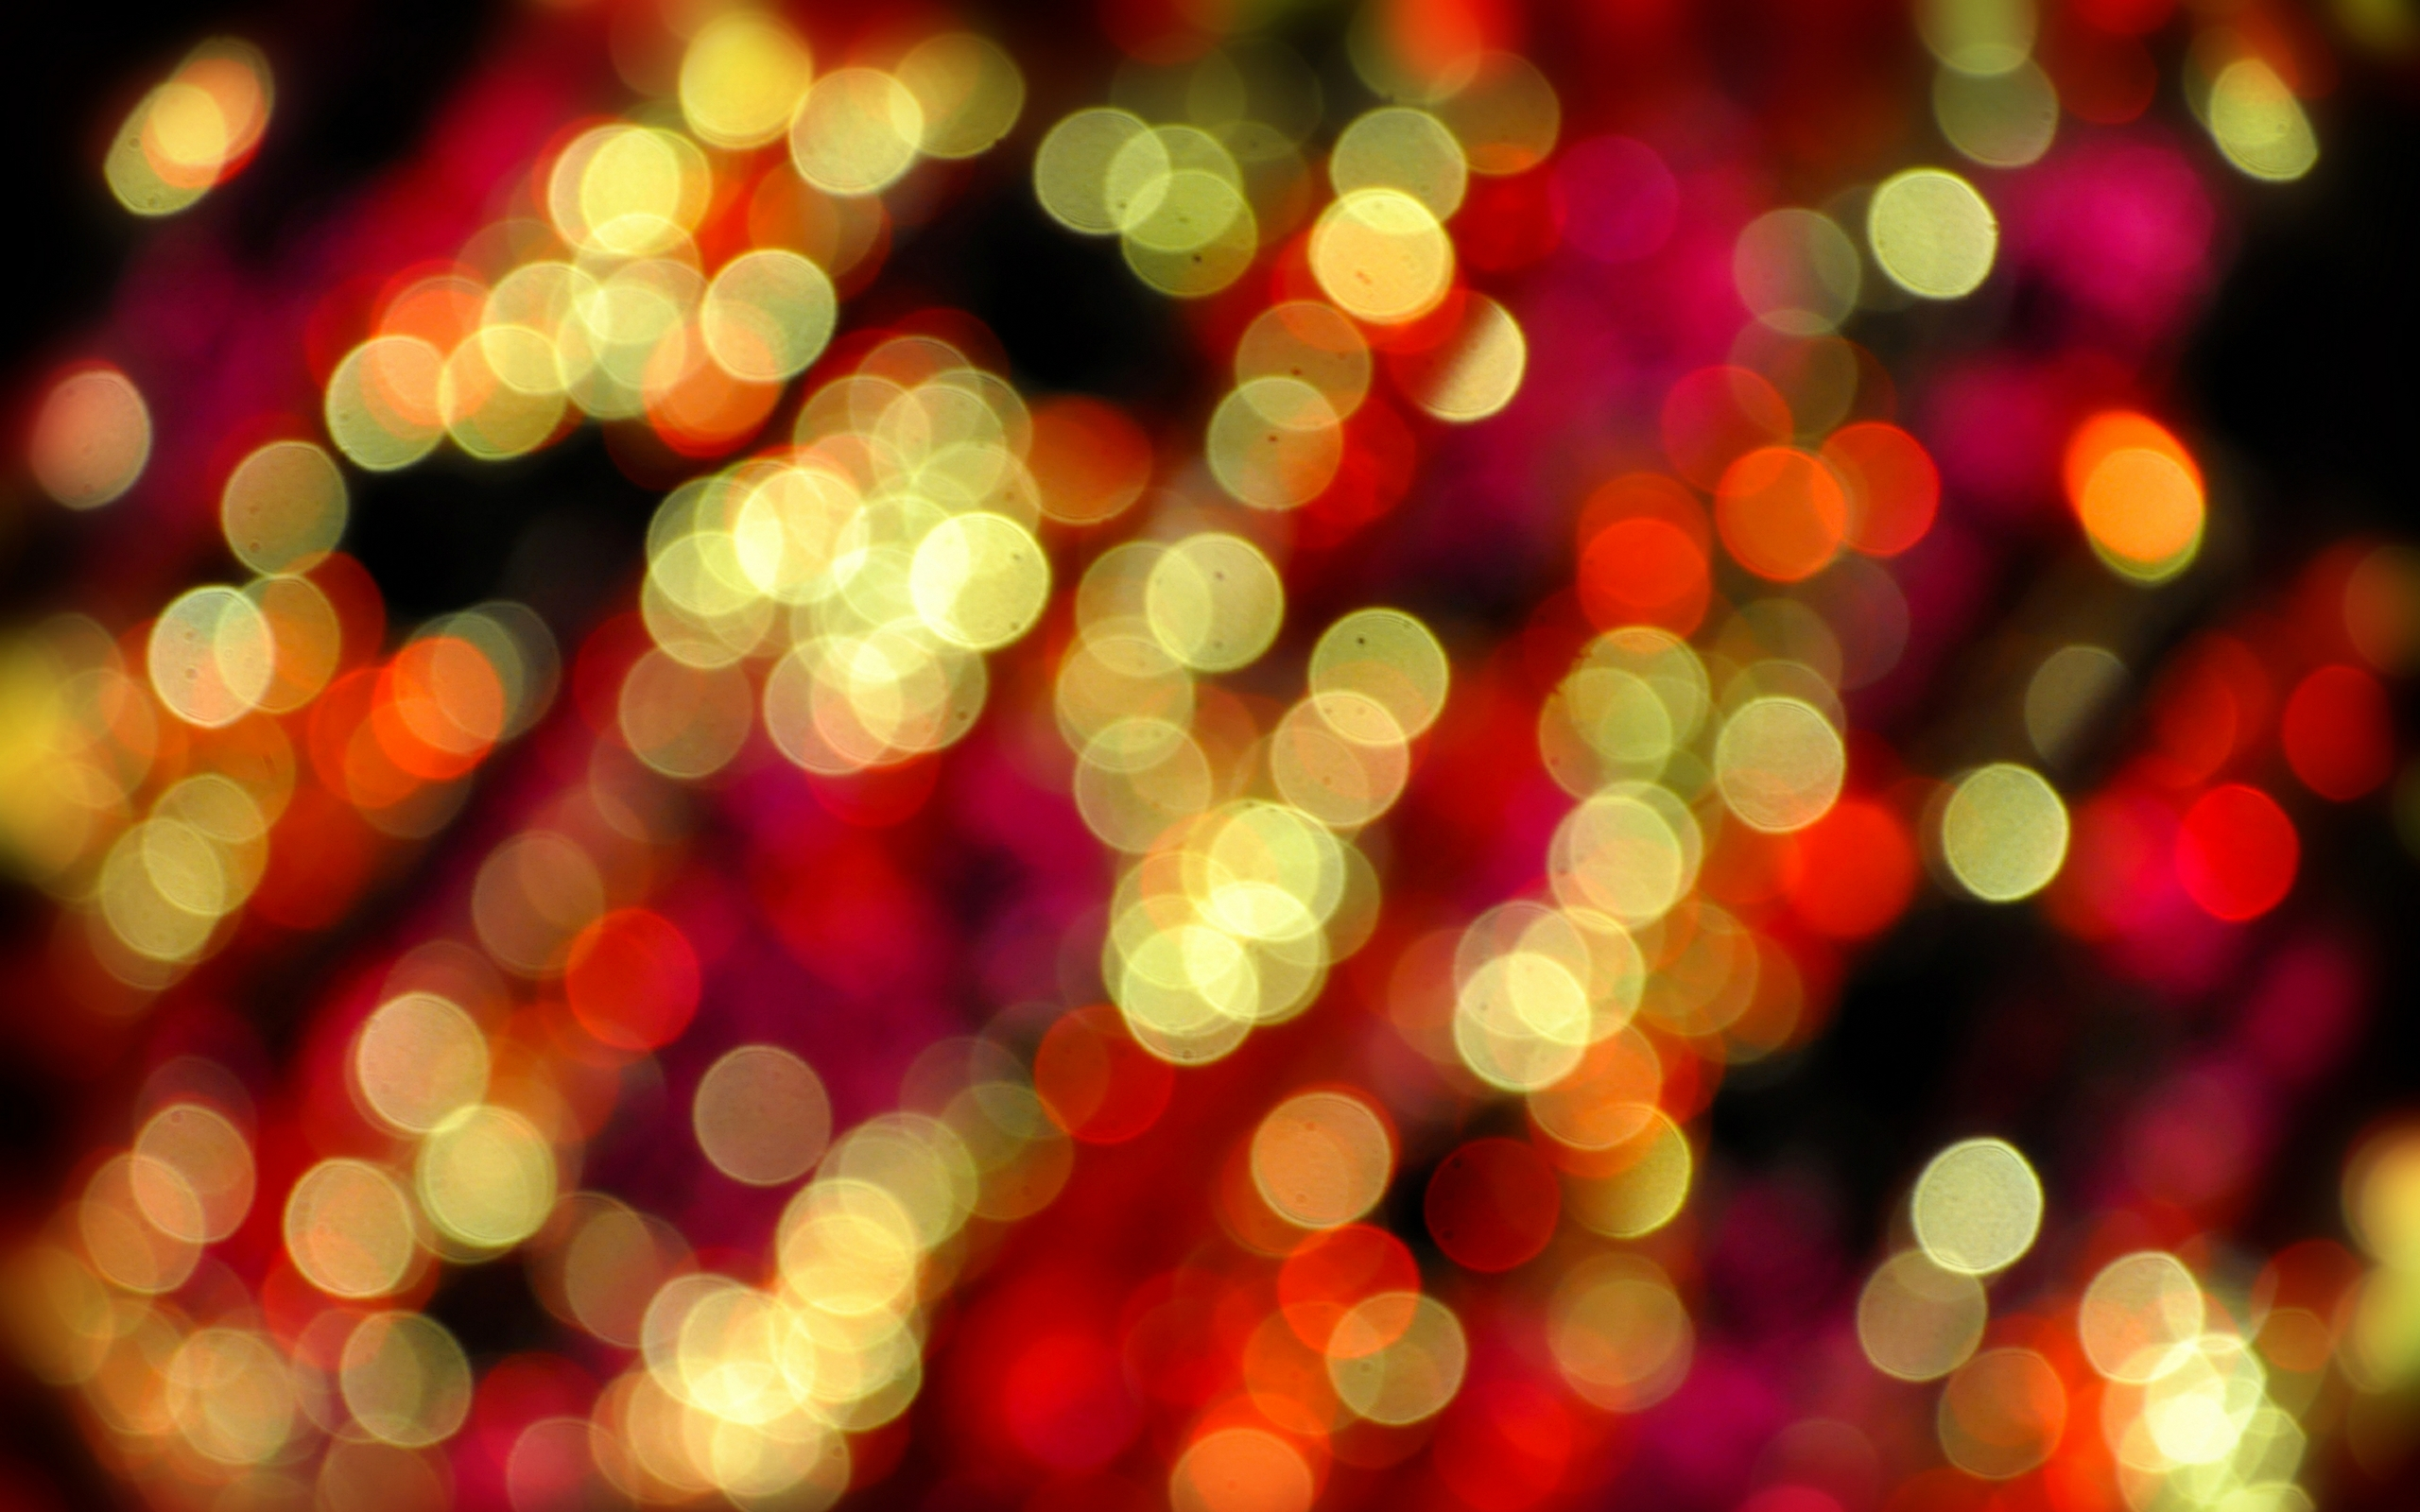 Christmas Lights Bokeh Wallpaper 24367 25027 Hd Wallpapers